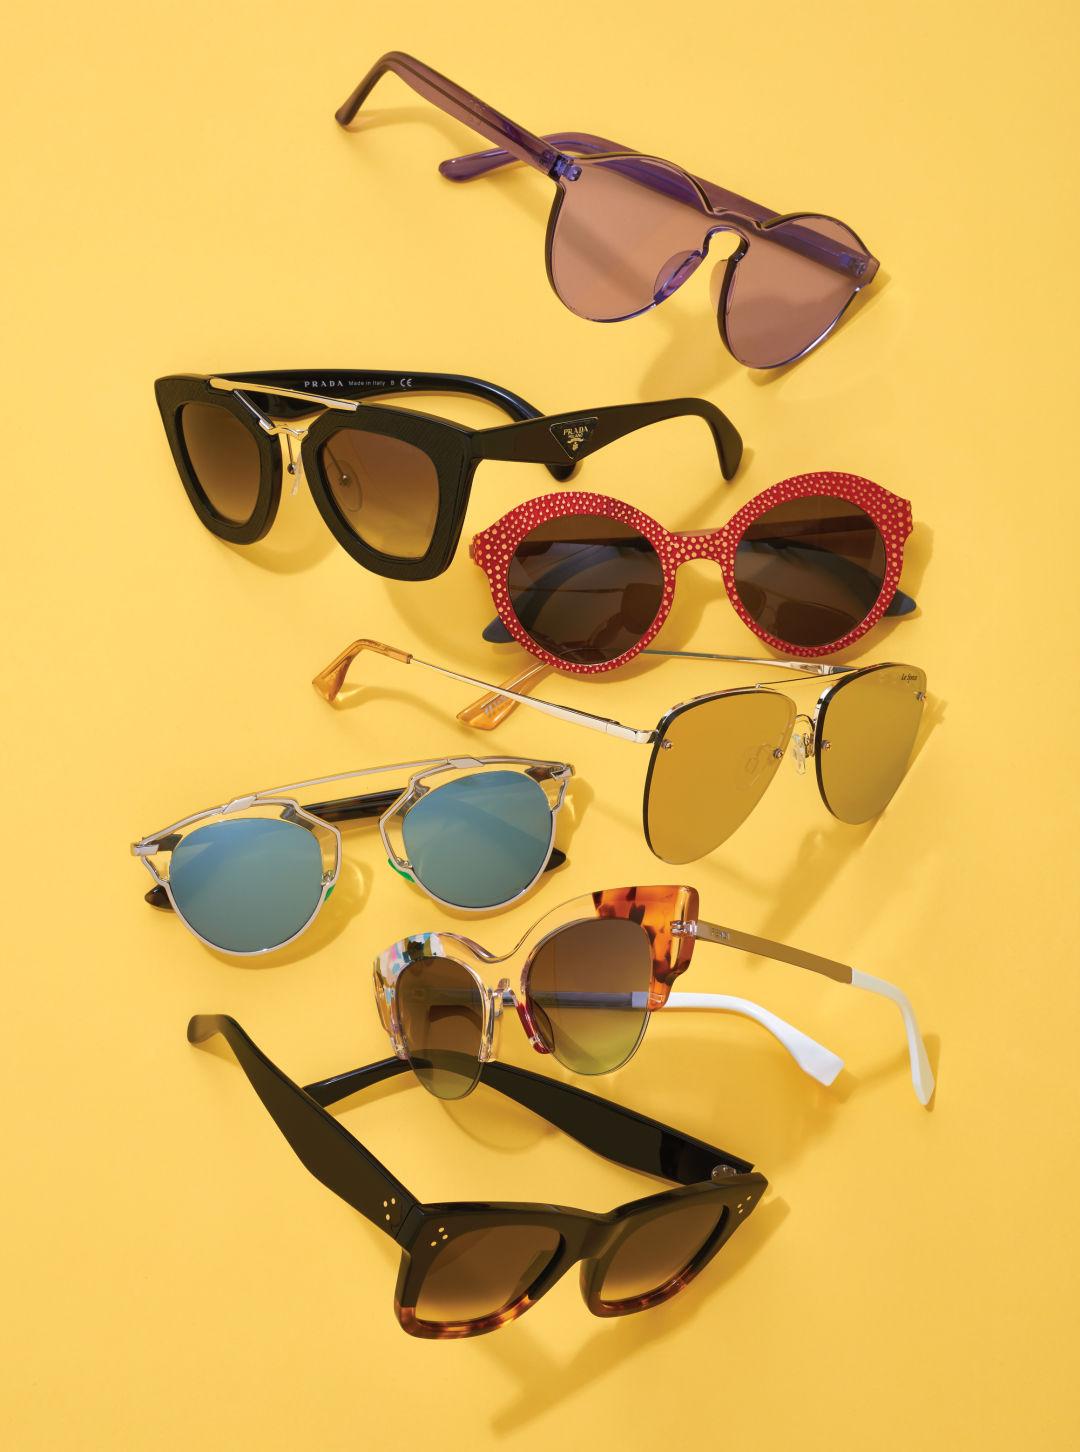 Sun glasses 8691 1 cmyk bhskwf